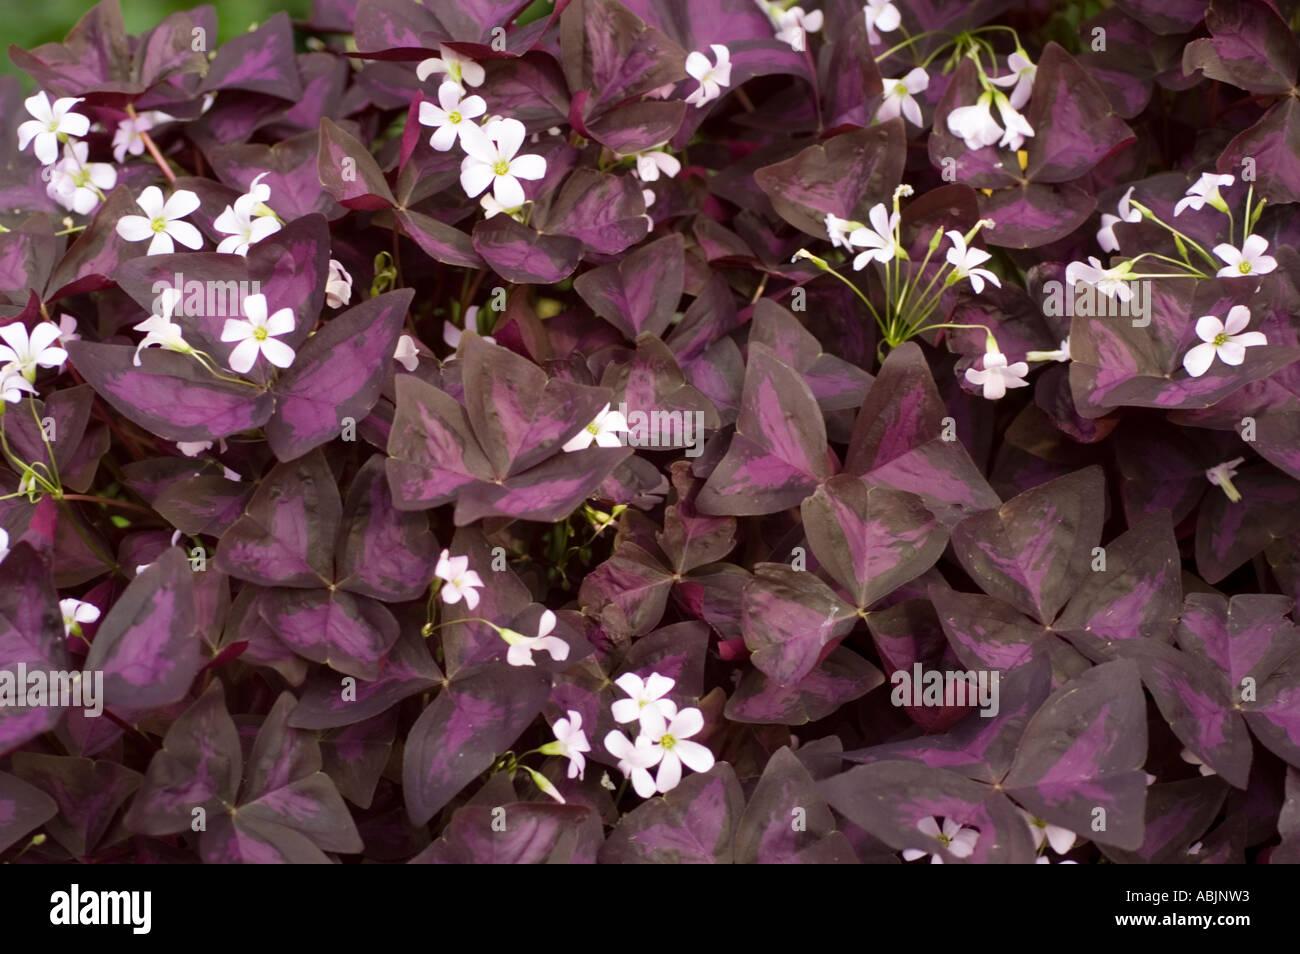 Oxalis triangularis white flower purple stock photos oxalis white flower and purple leaves of purple shamrock or crimson iron cross oxalis triangularis stock mightylinksfo